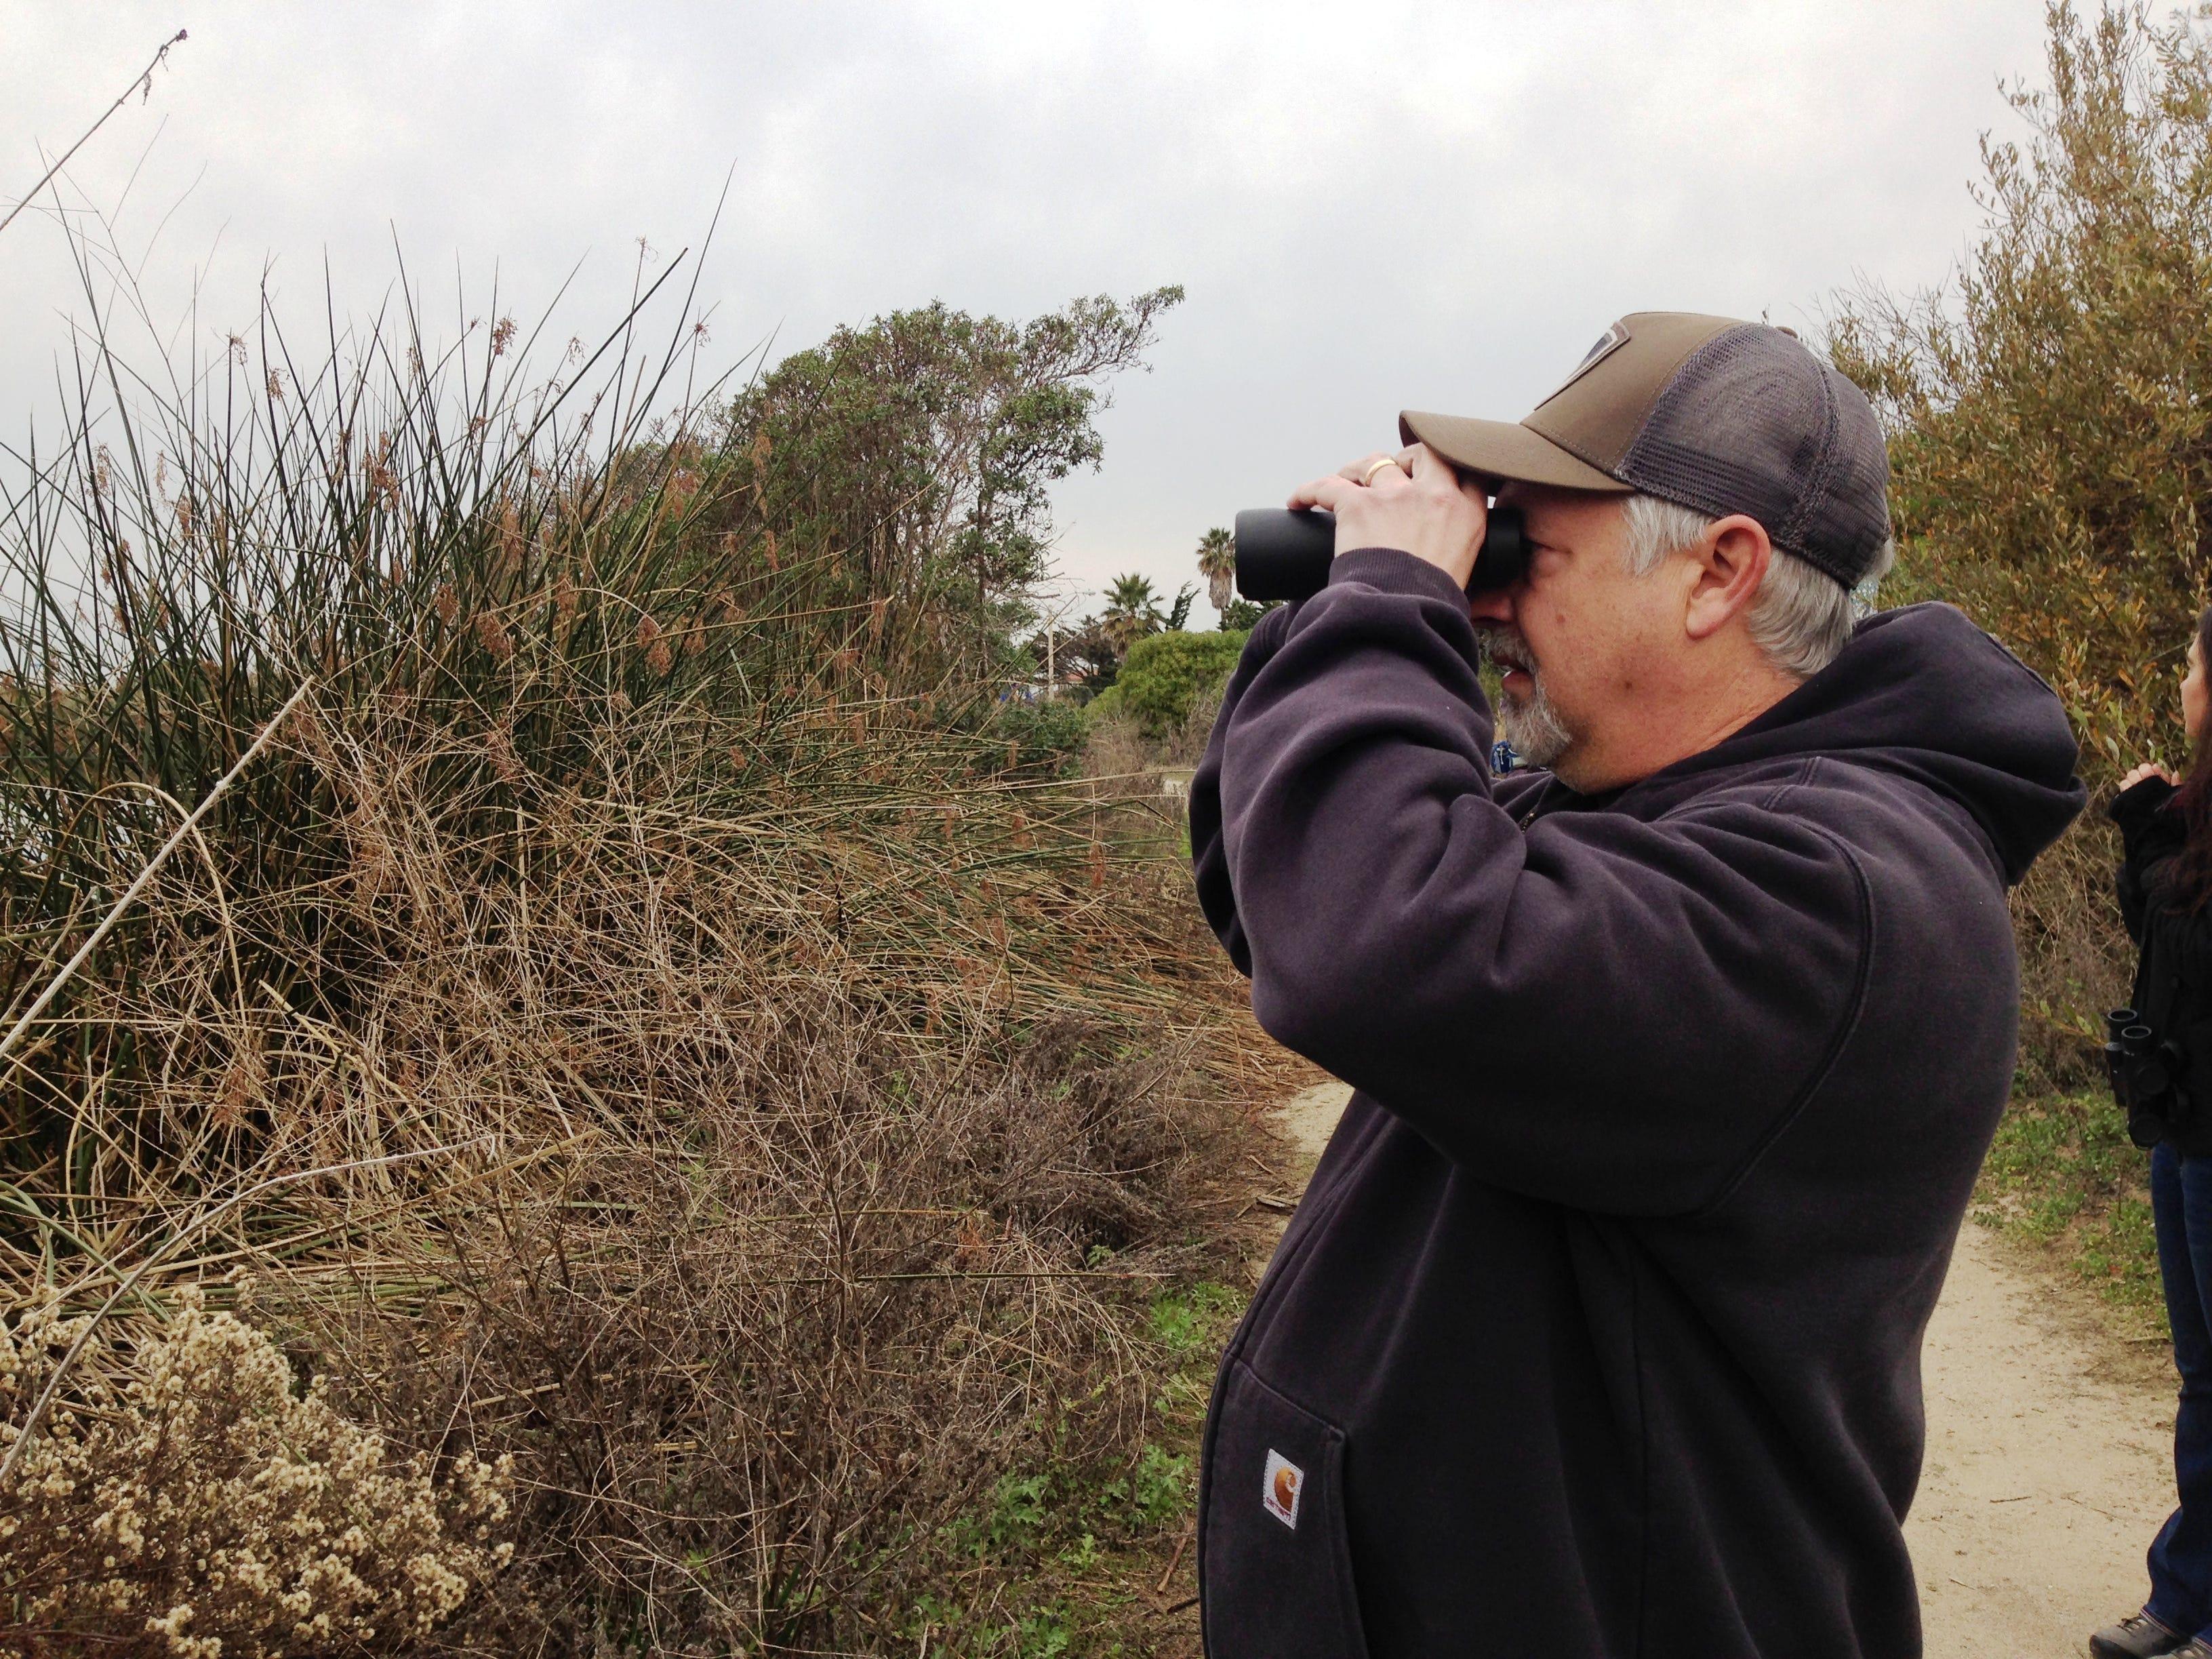 Matt Schaberg uses binoculars to count birds during the Christmas Bird Count on Saturday at the settling ponds near Ventura Harbor.